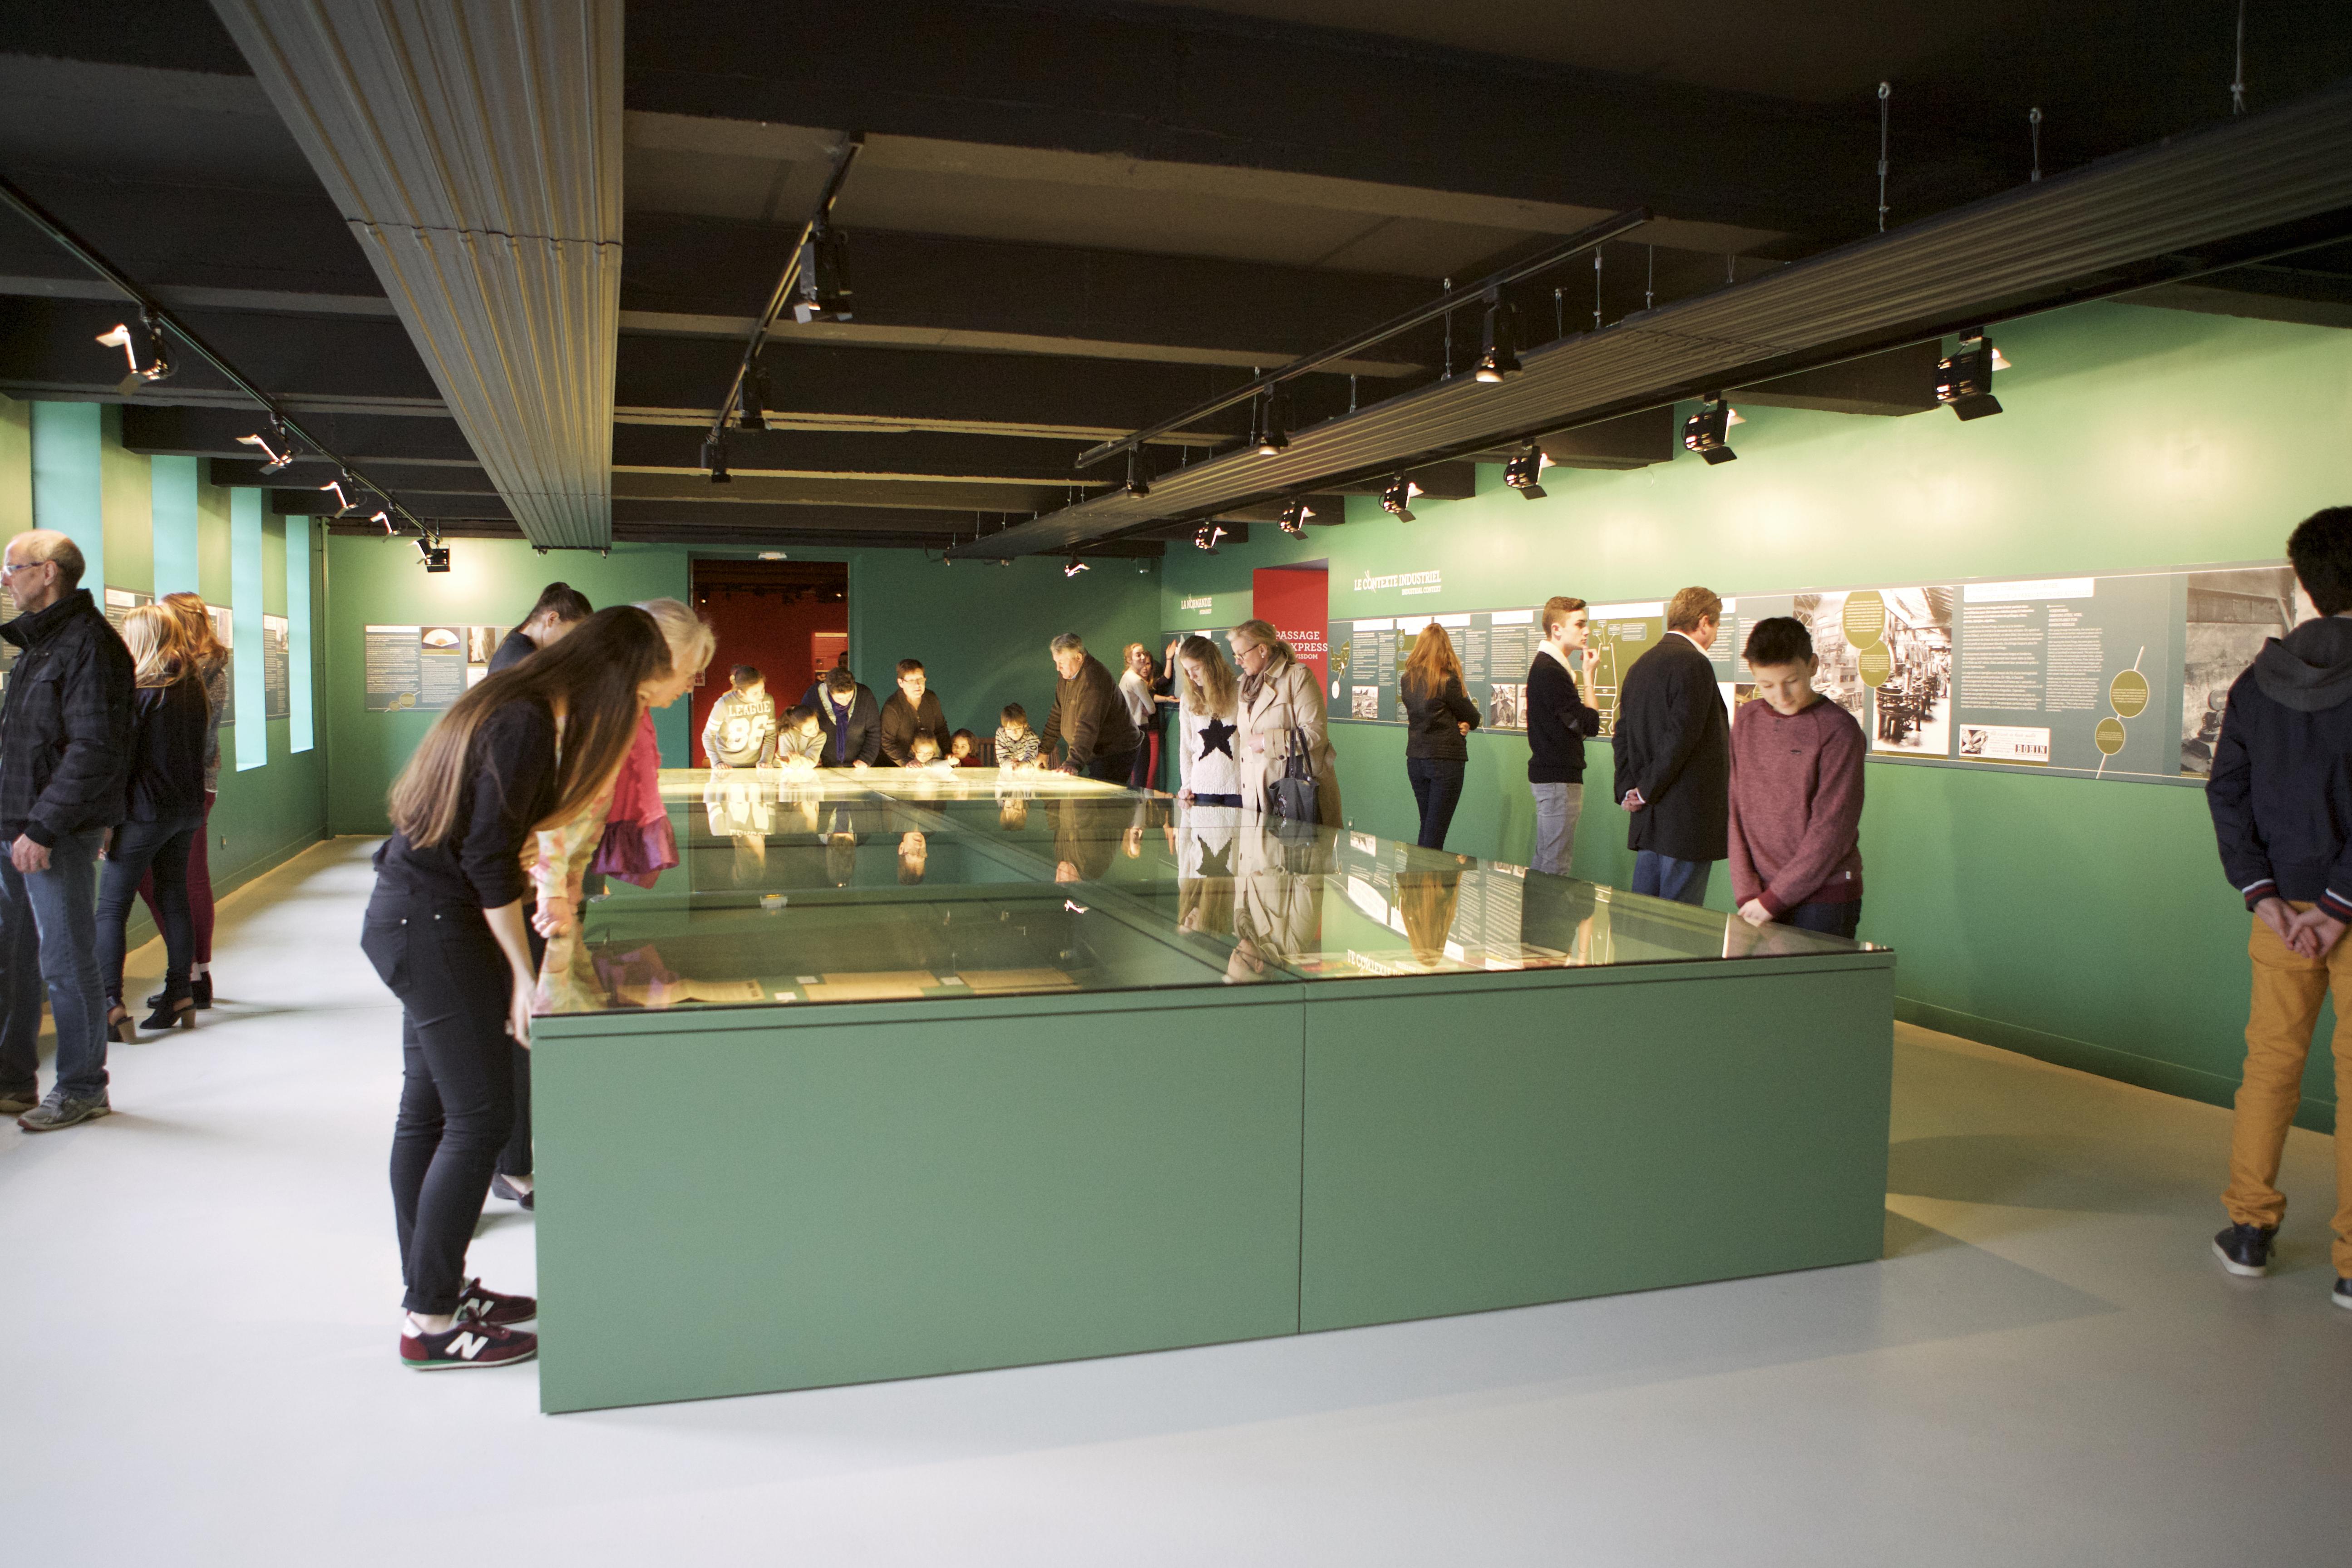 la-manufacture-bohin-musee-la-normandie-et-le-contexte-industriel-la-manufacture-bohin